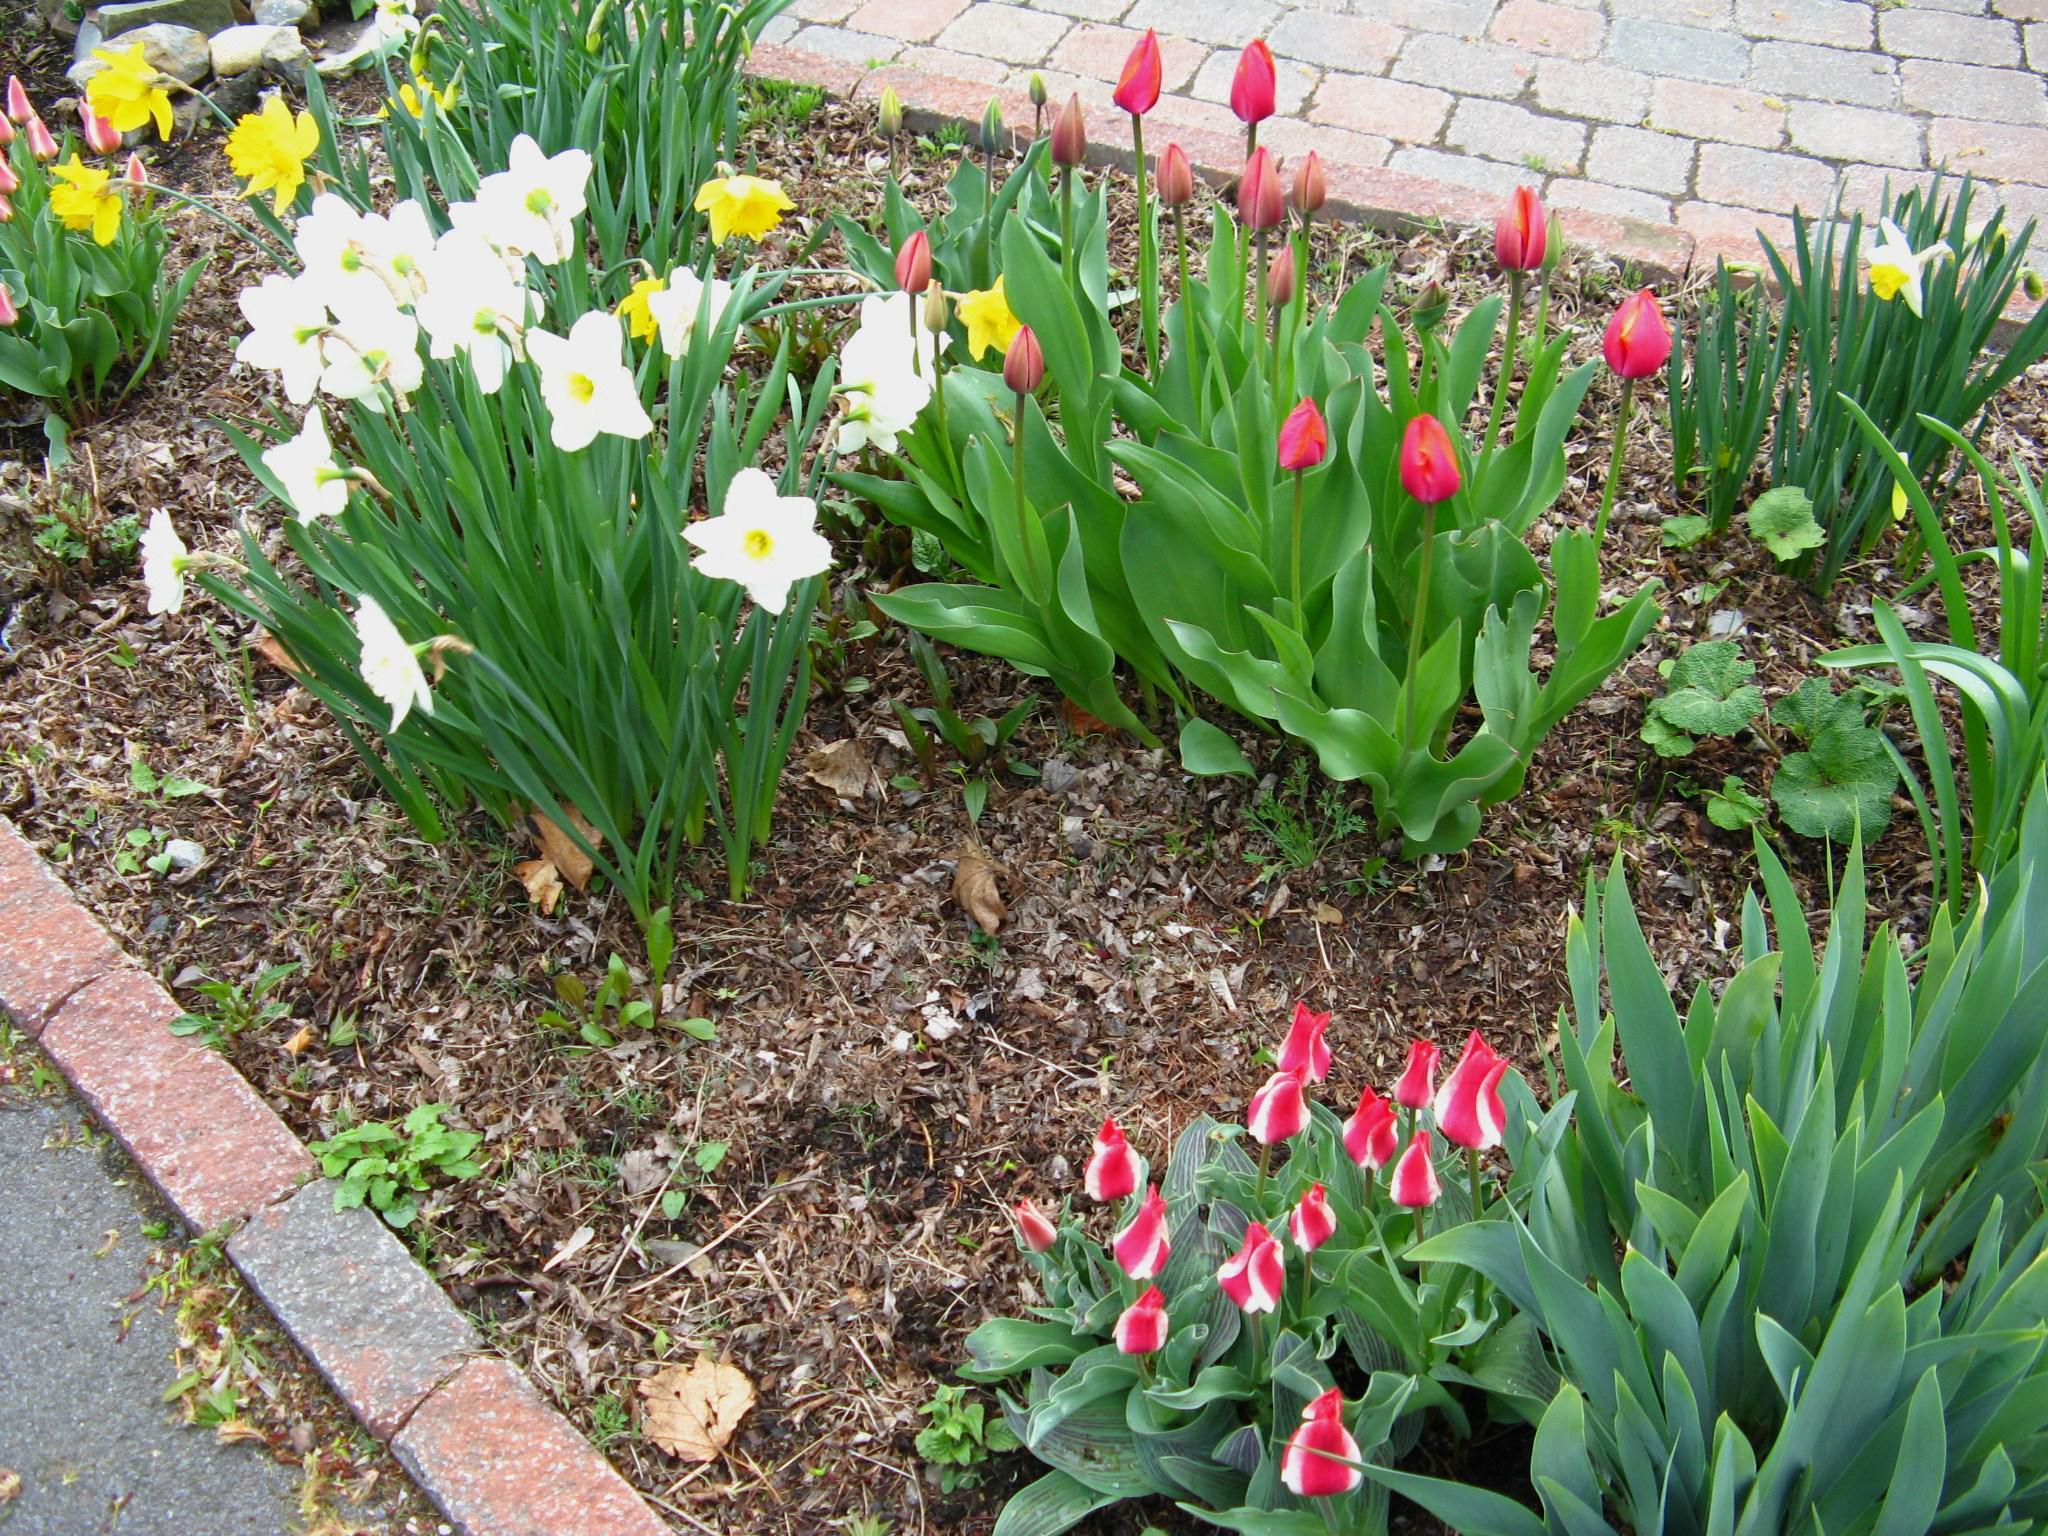 Glts Grow Spring To Do List Wglt